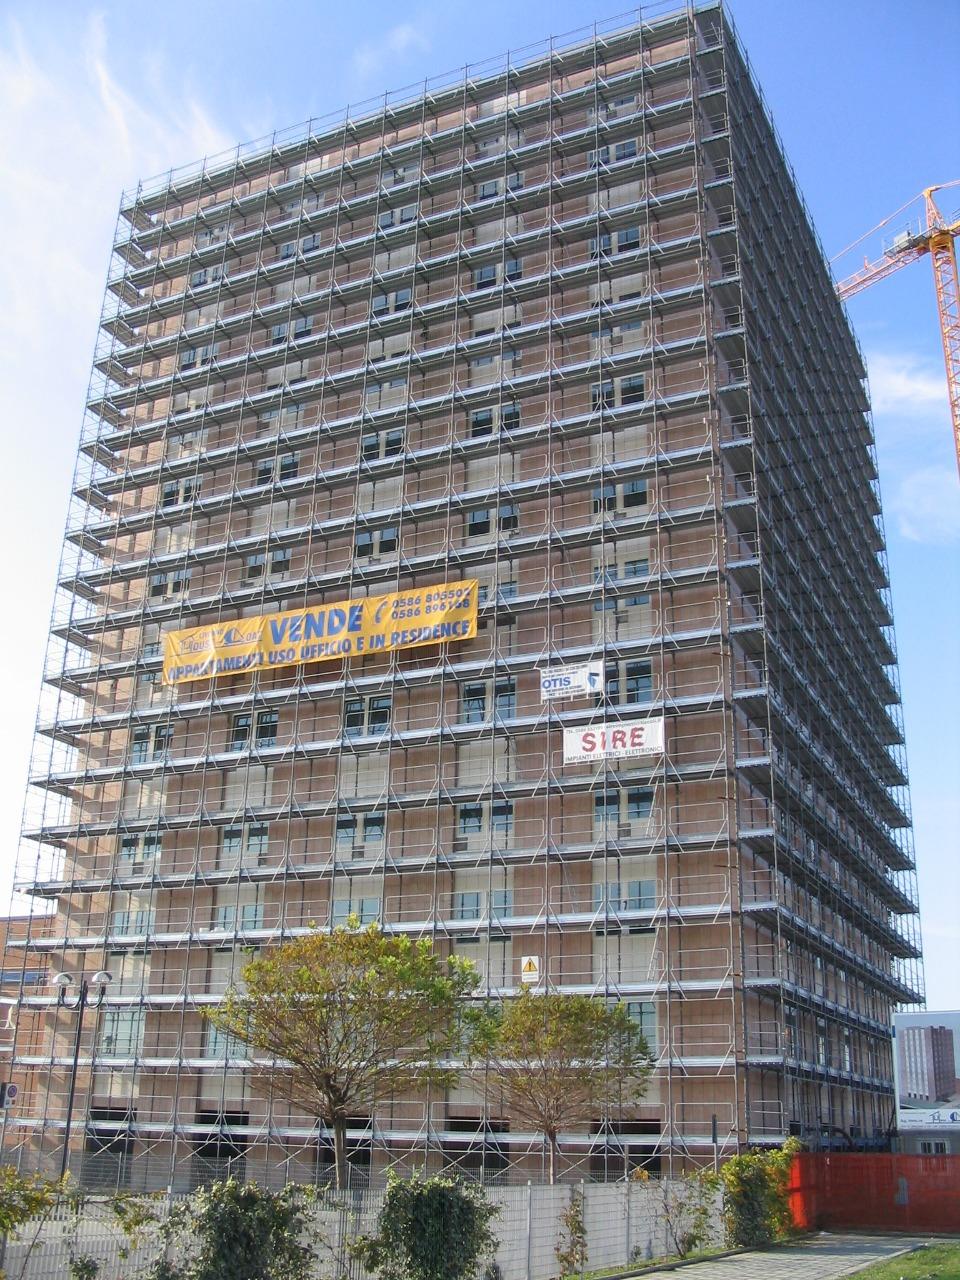 Gallery foto n.1 PHZ 105 - تنفيذ مبنى متعدد الاستخدامات